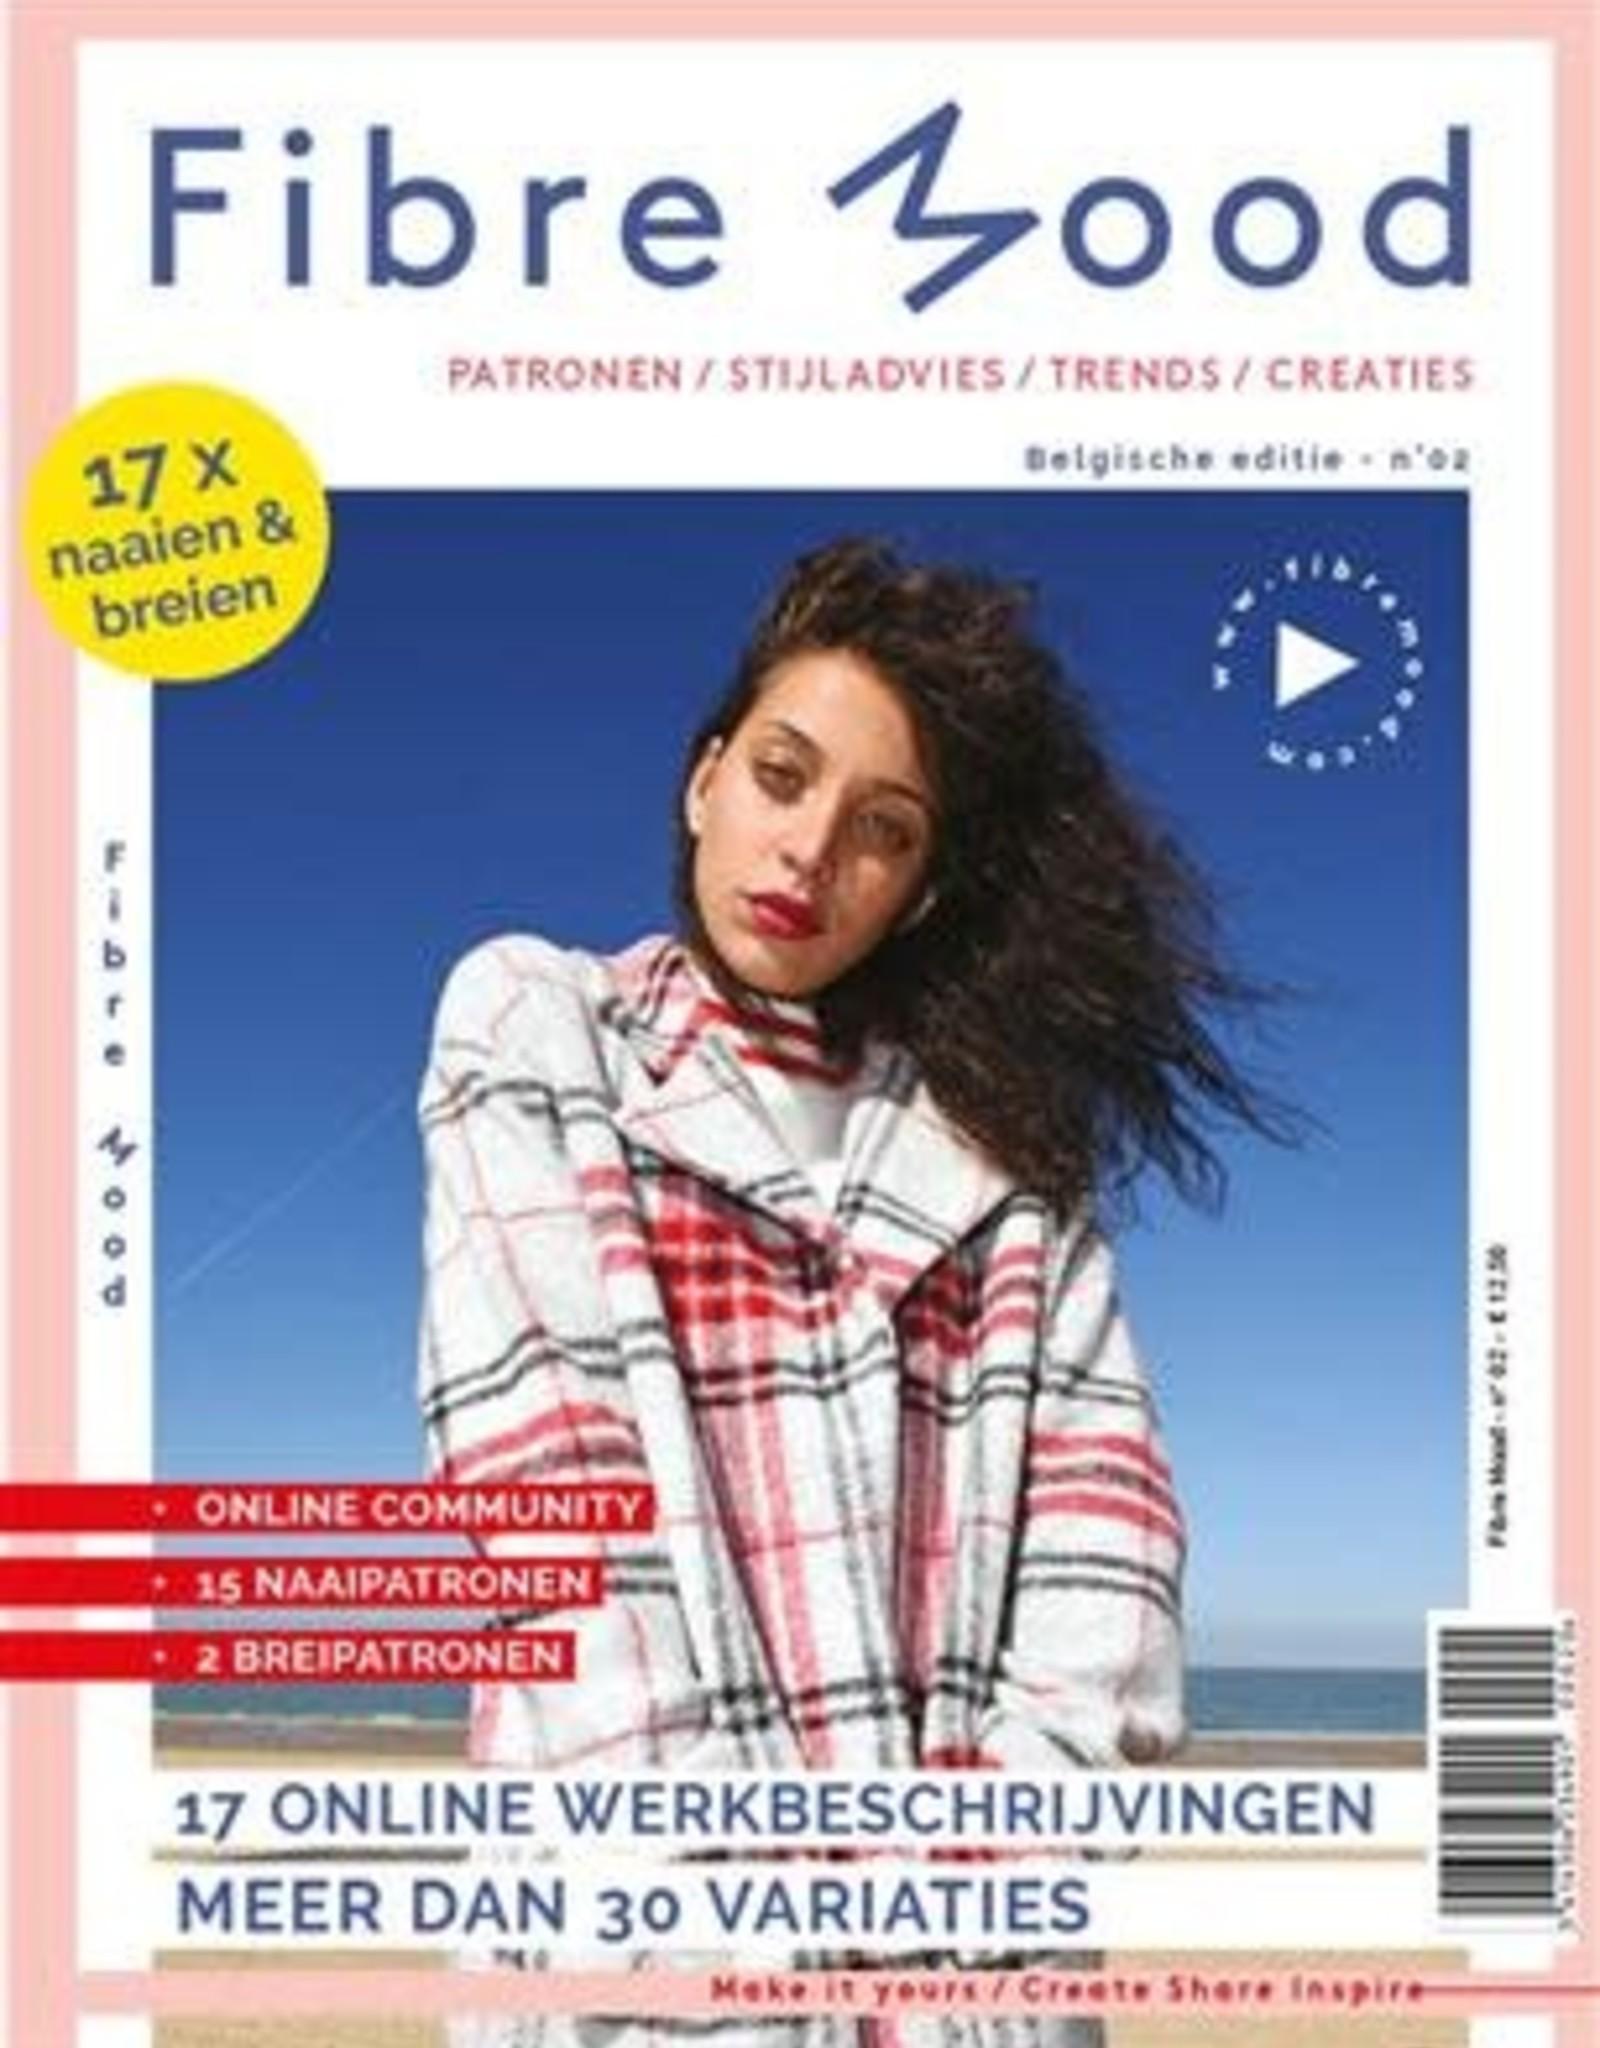 Fibre Mood Fibre Mood magazine editie 2 (duitstalig)